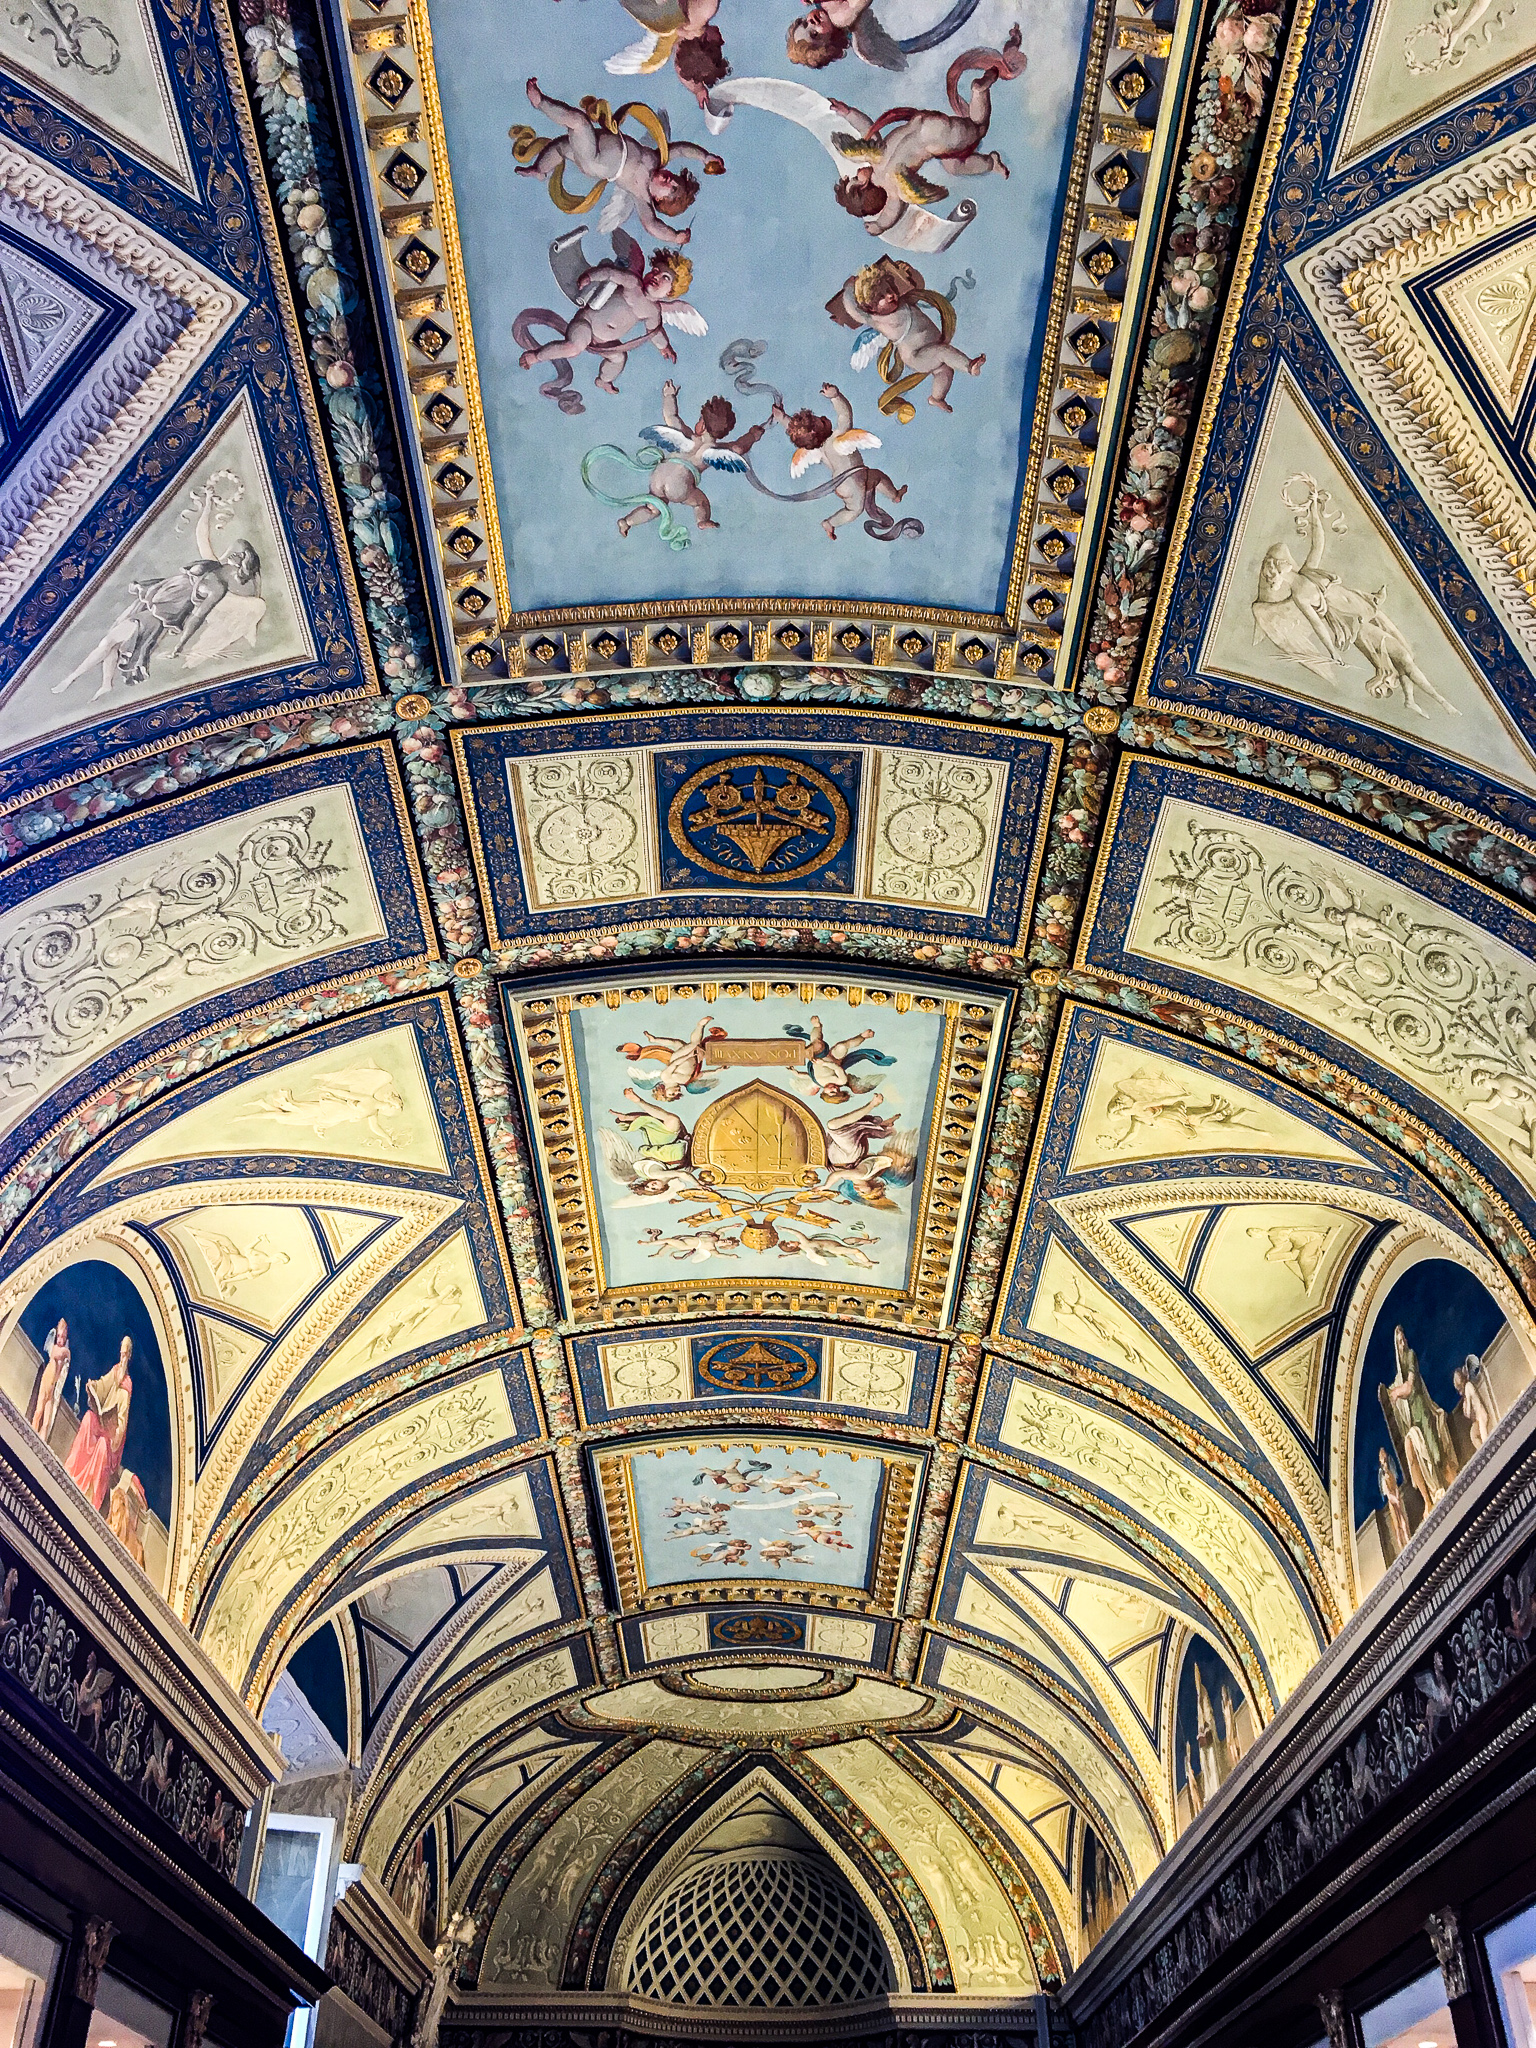 Discover Rome's History Through Art